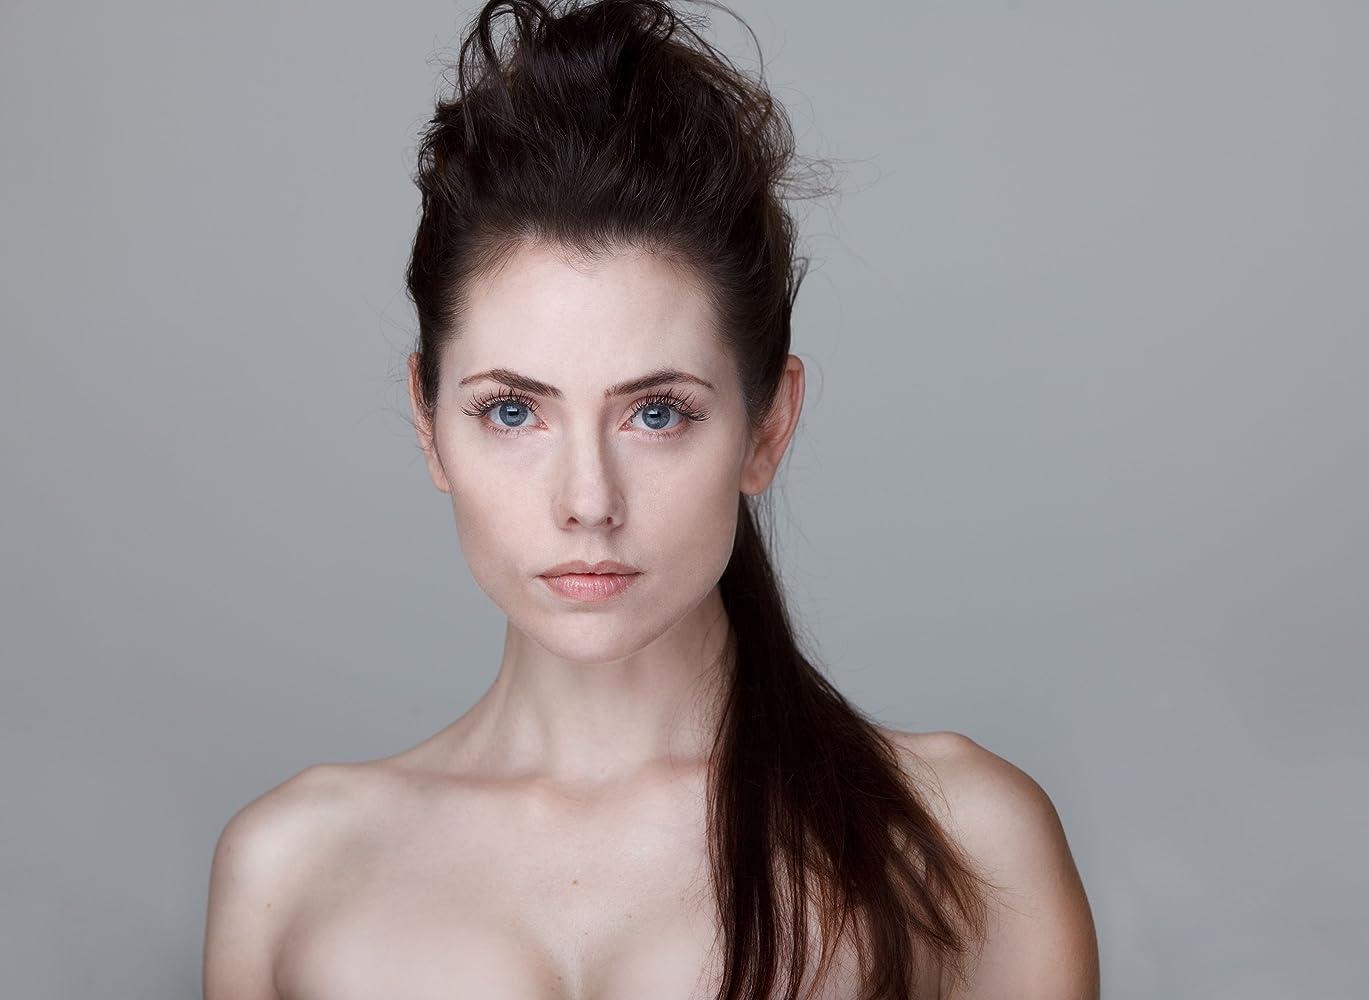 Adrienne Wilkinson nude photos 2019